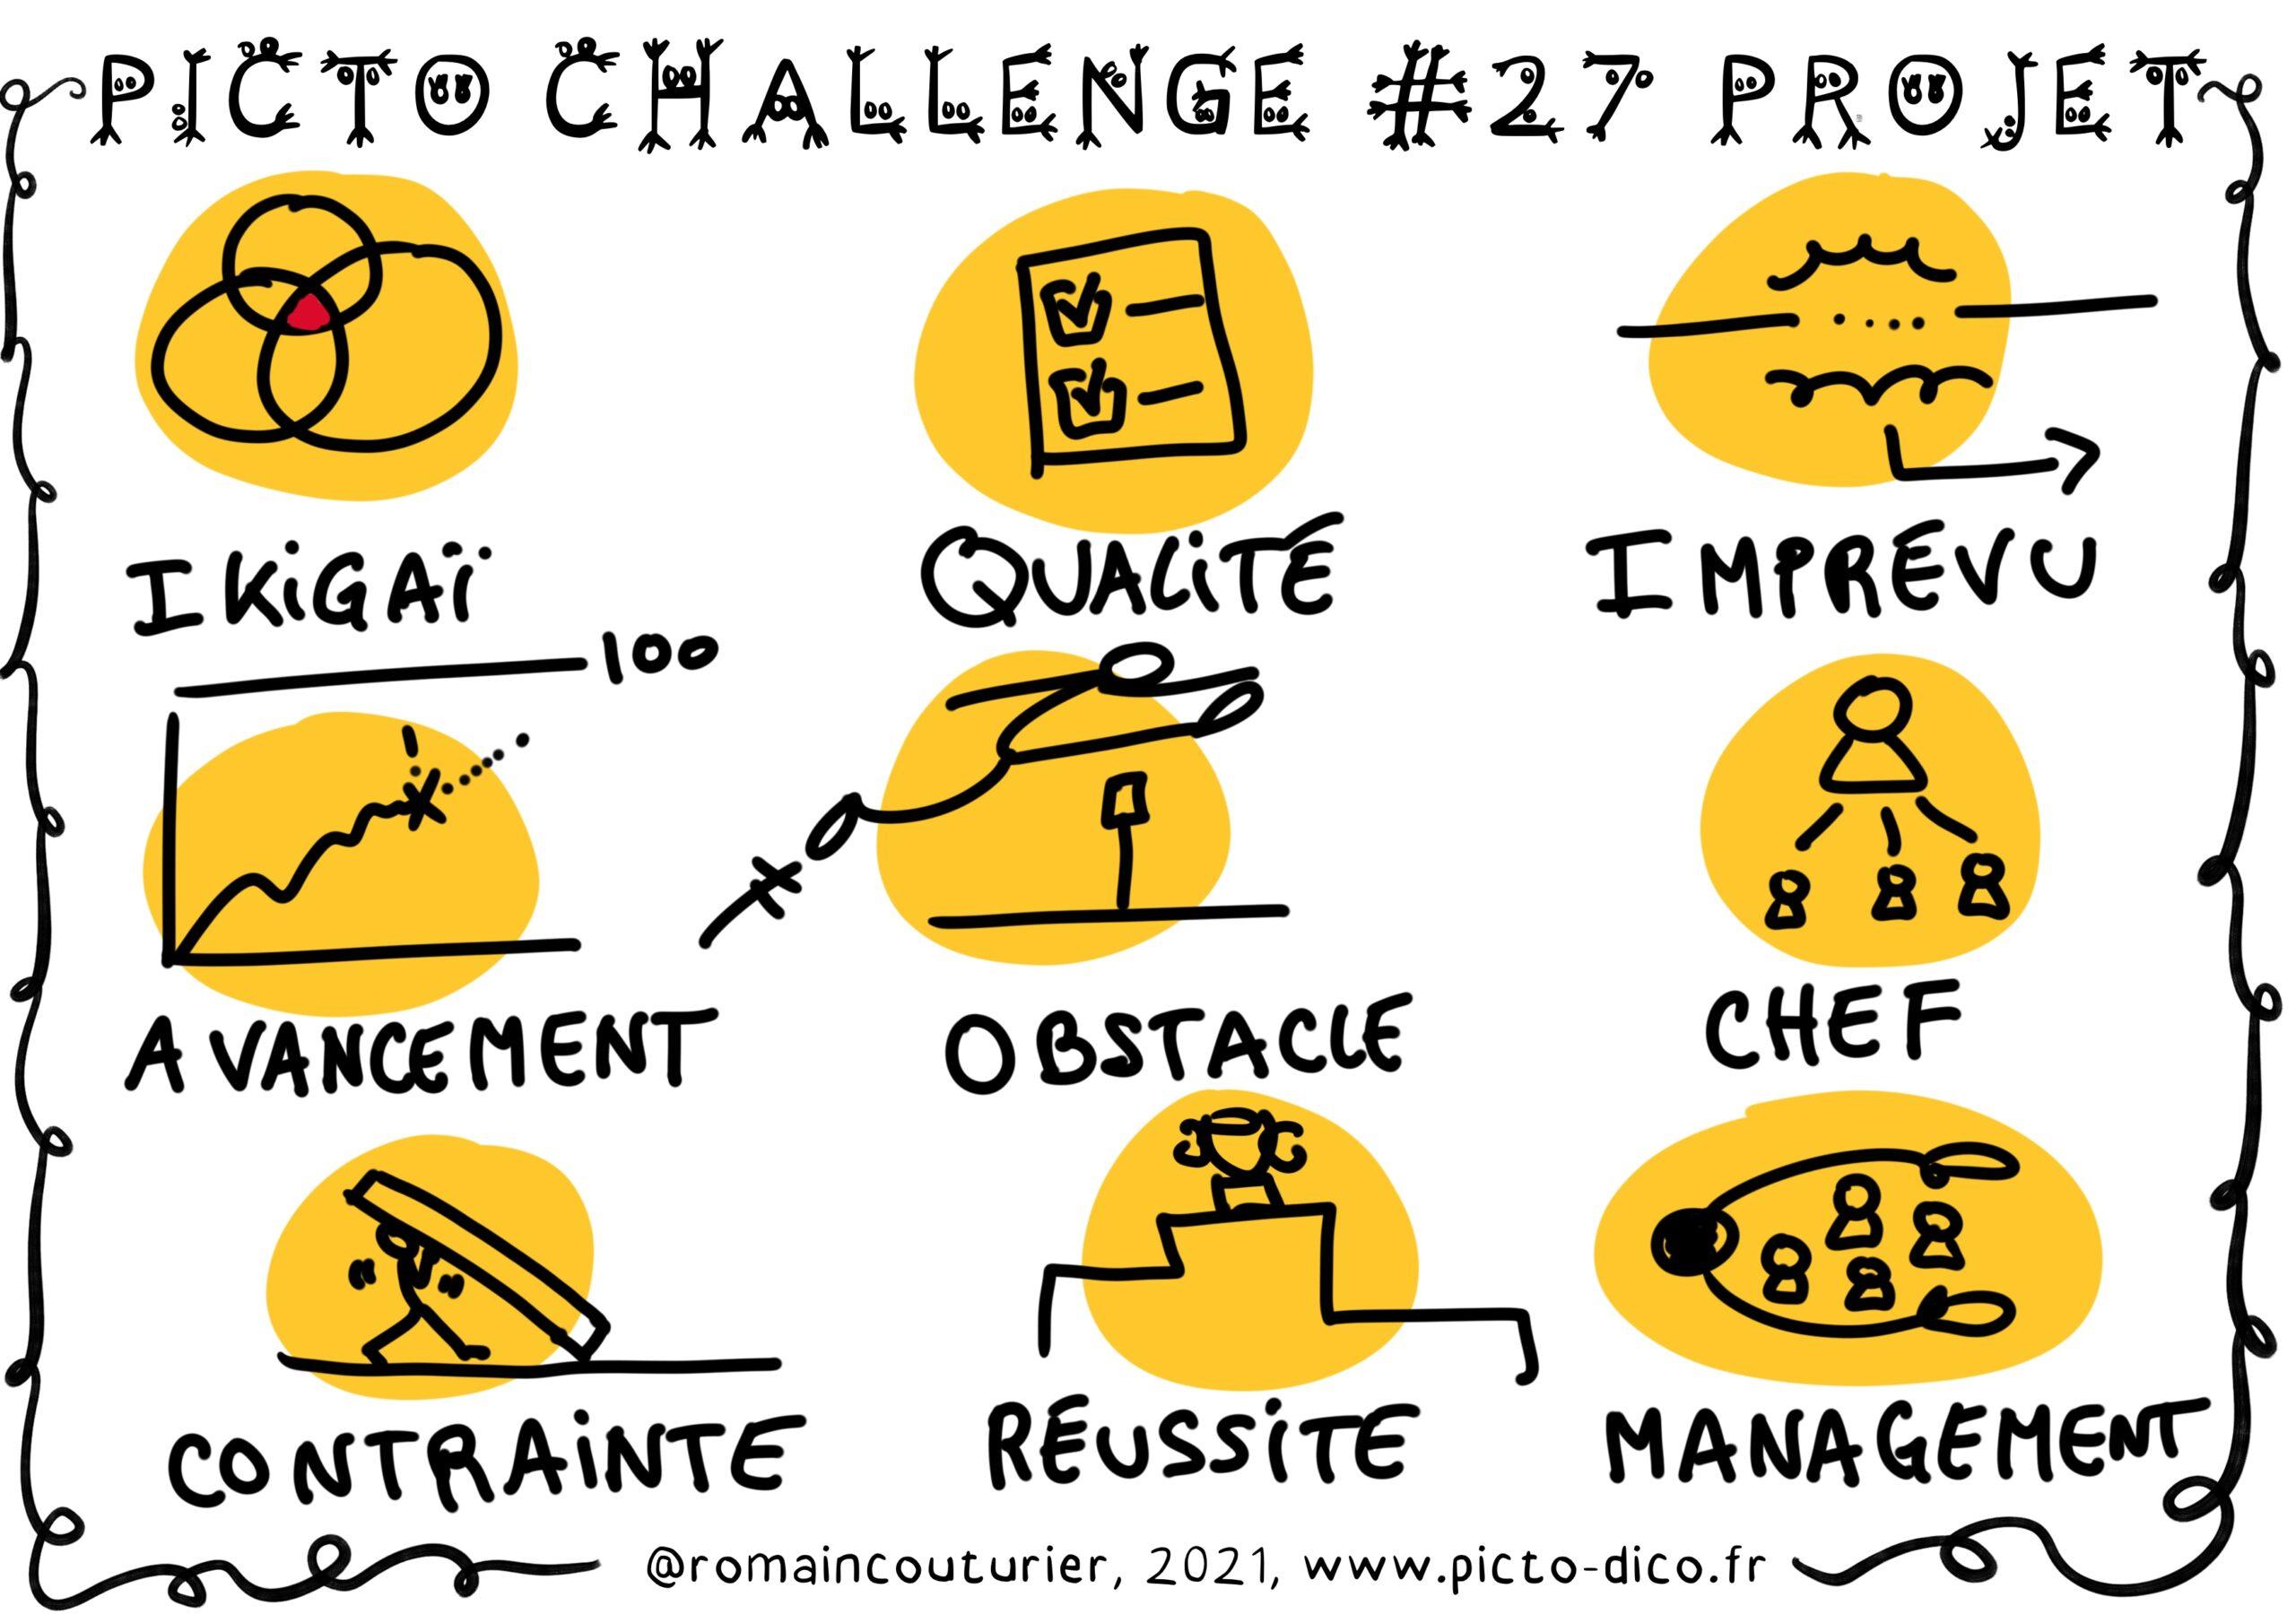 PictoChallenge n°27 spécial Projet